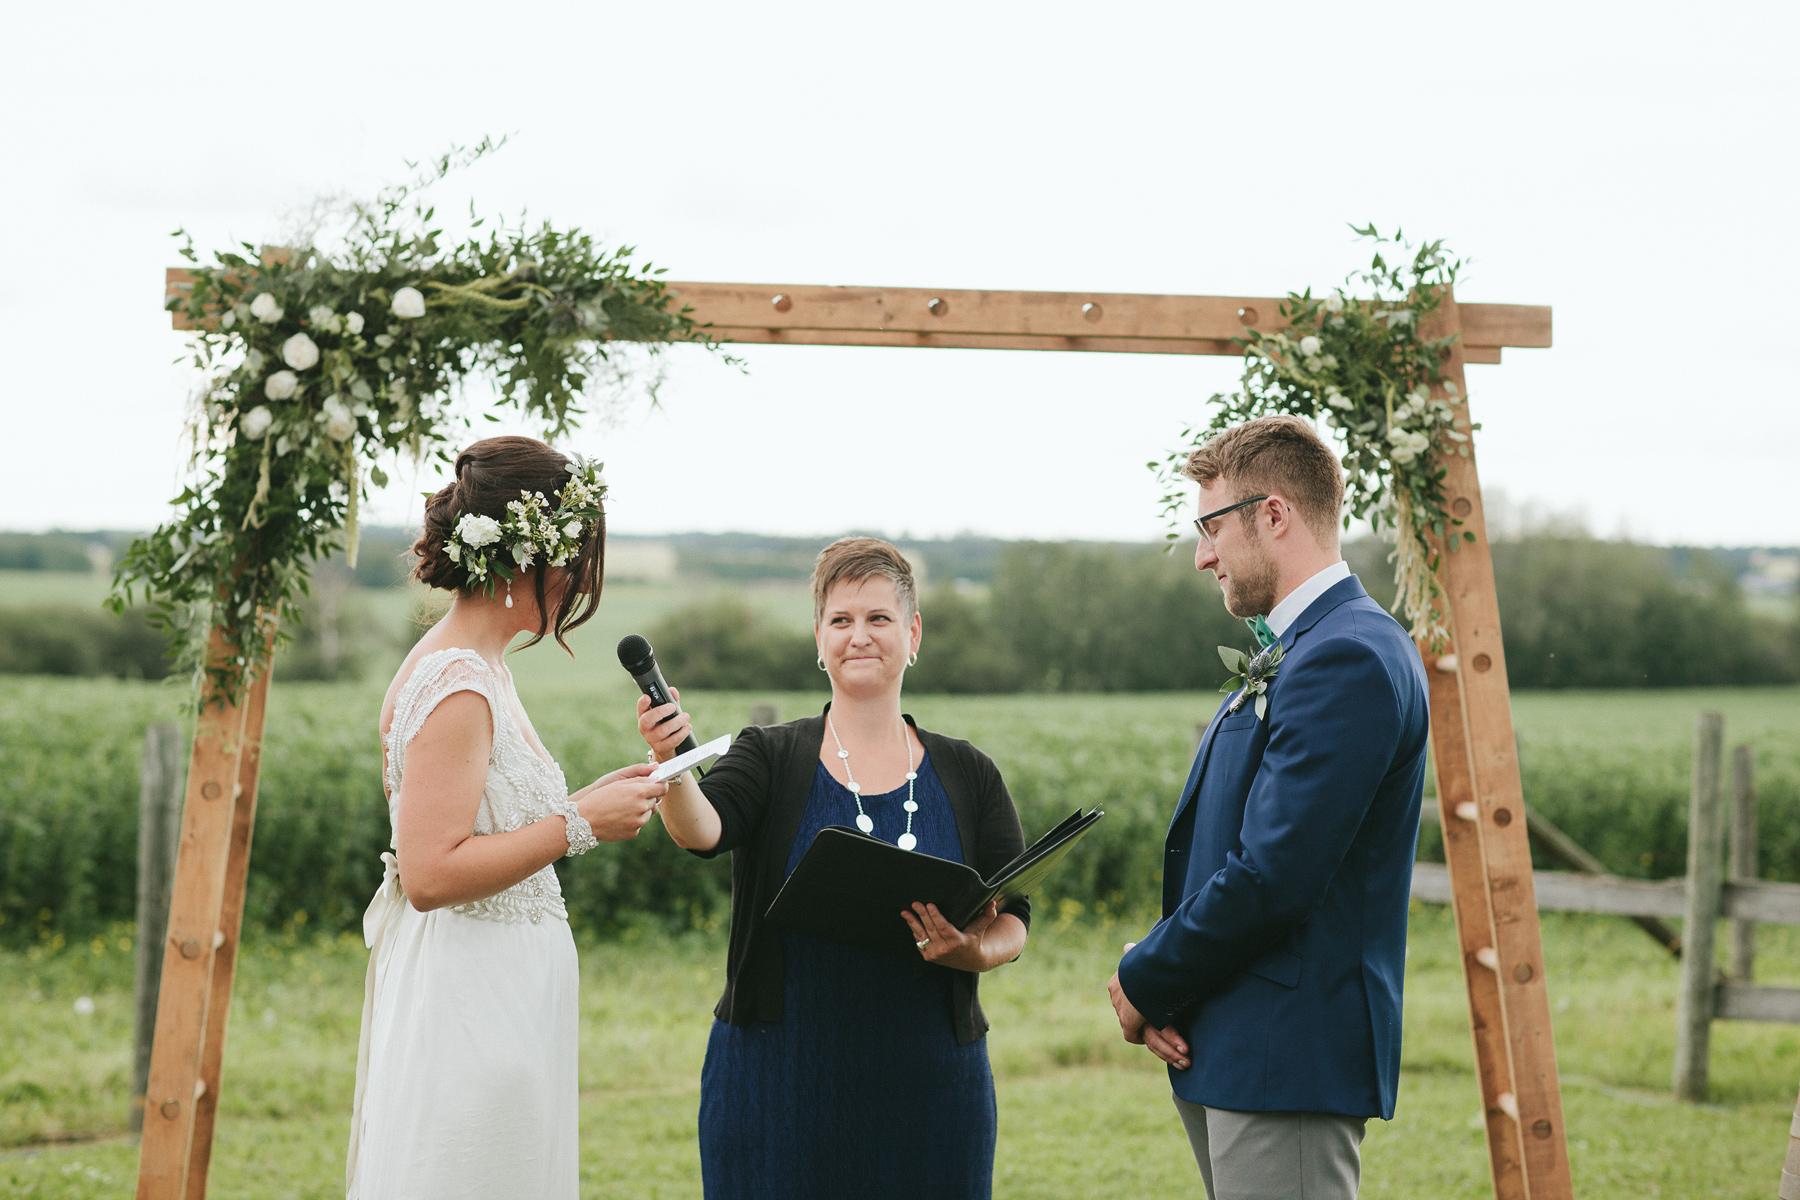 alberta-farm-wedding-photographer-rp-wj-135.jpg